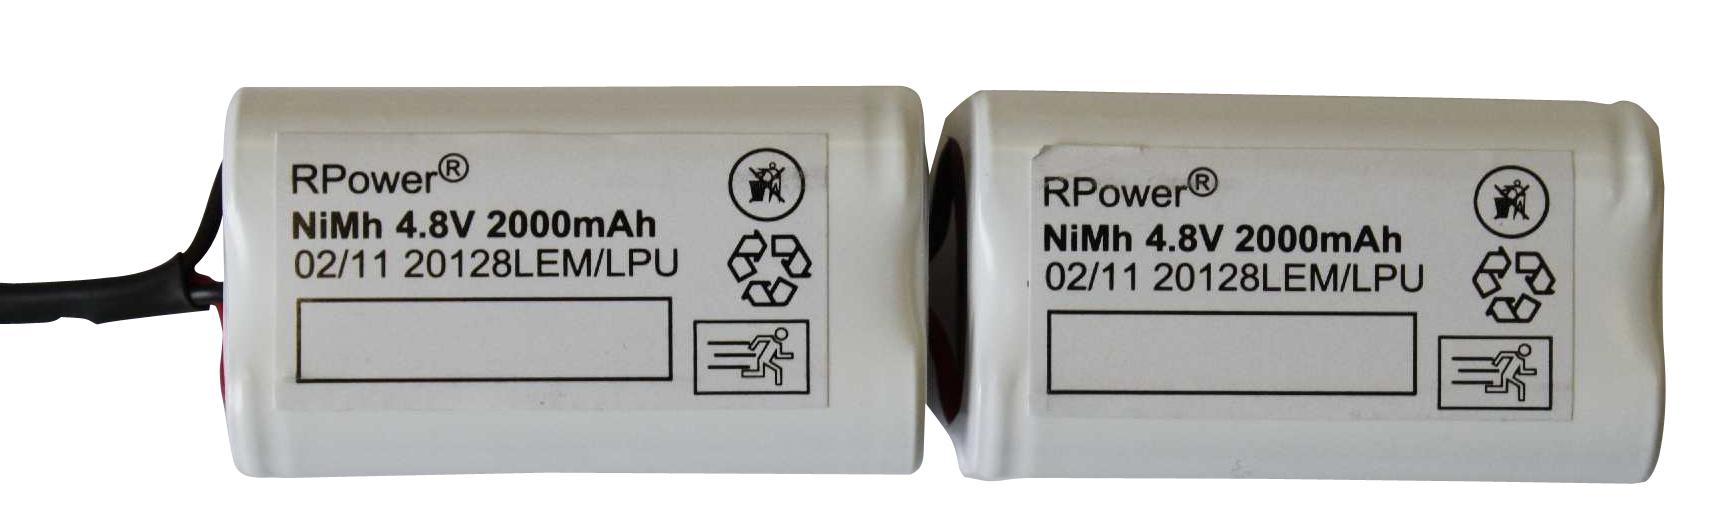 Akku 9,6V 2,0 Ah für EB-Leuchten ERT-LED 1h, 3h, 8h